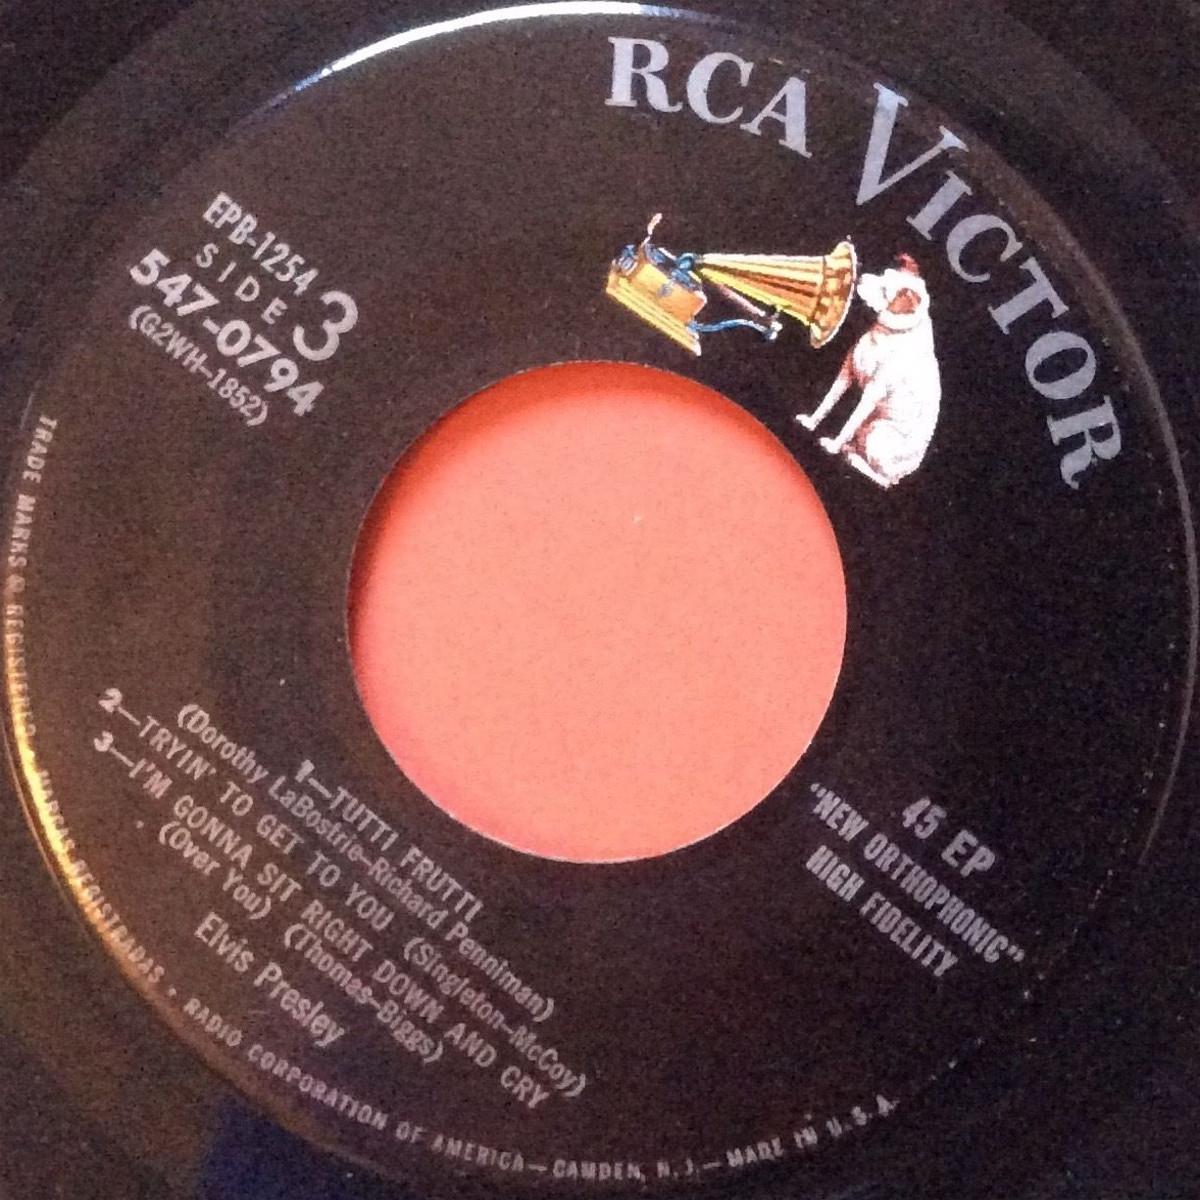 Presley - ELVIS PRESLEY Epb1254e0xbb2